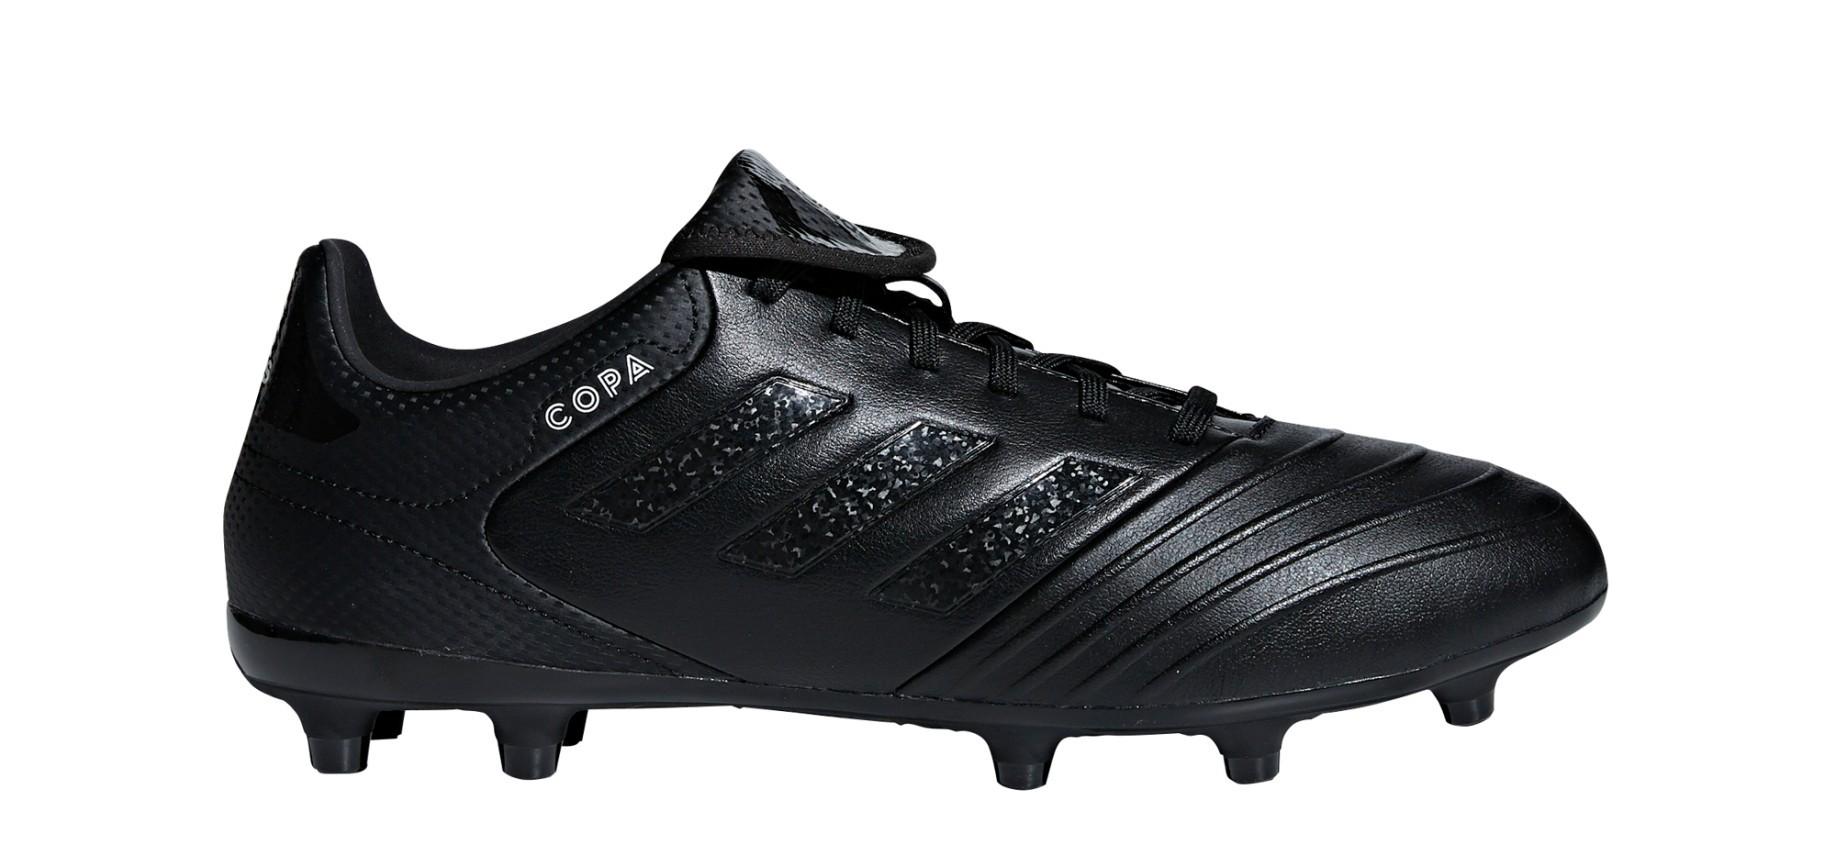 new product 847ec 0217b Football boots Adidas Copa 18.3 FG Shadow Mode Pack colore Black - Adidas -  SportIT.com